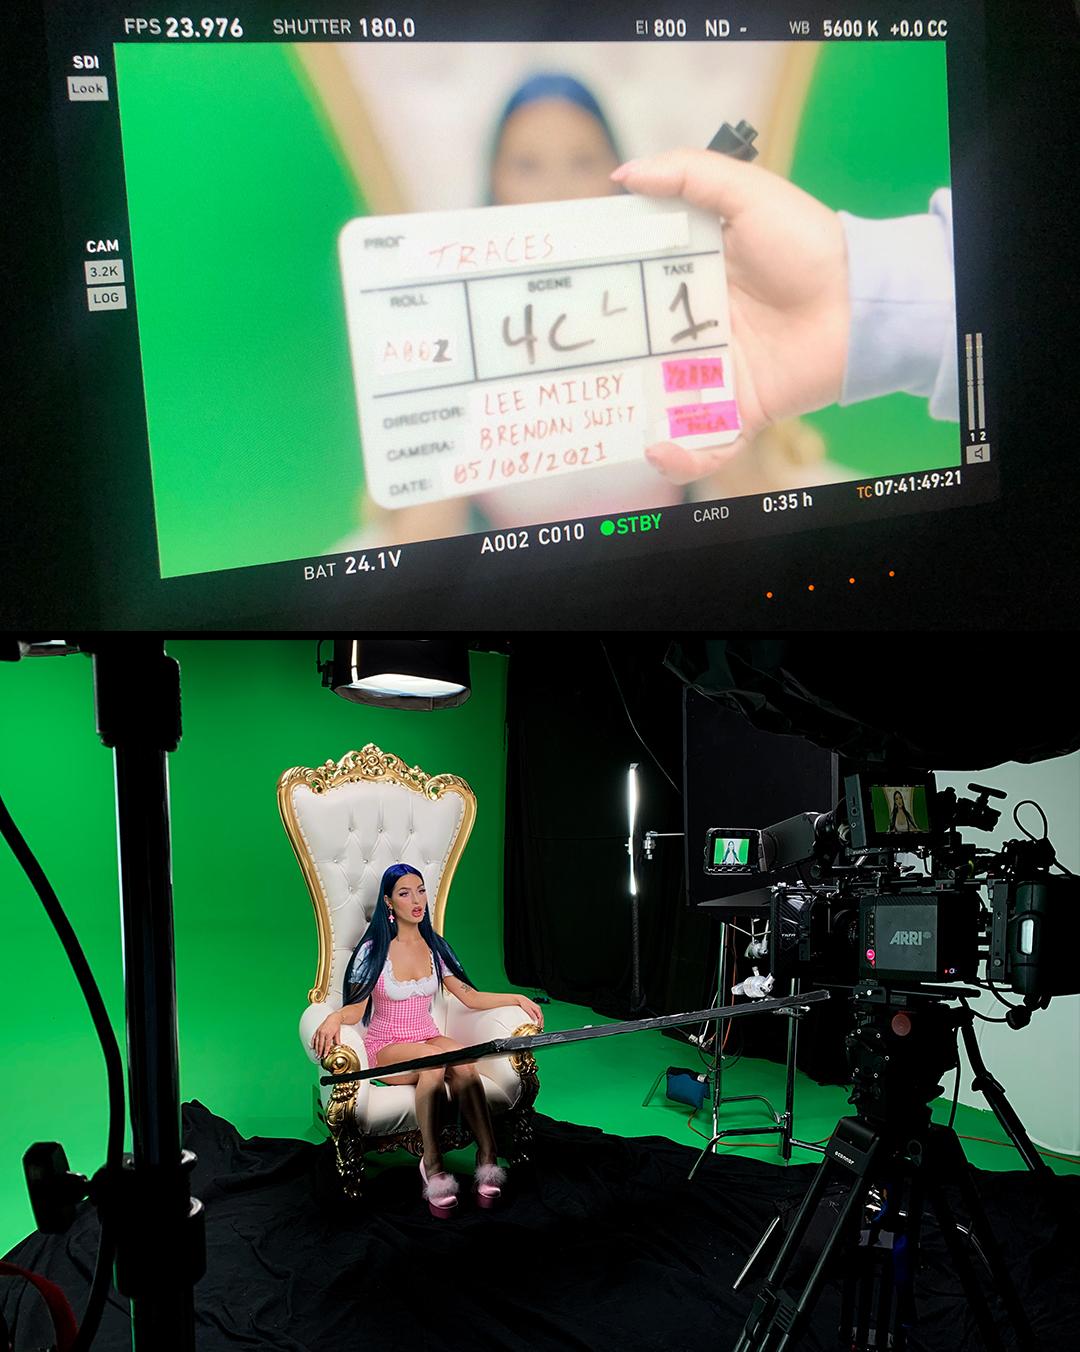 behind the scenes greenscreen studio shoot new york city